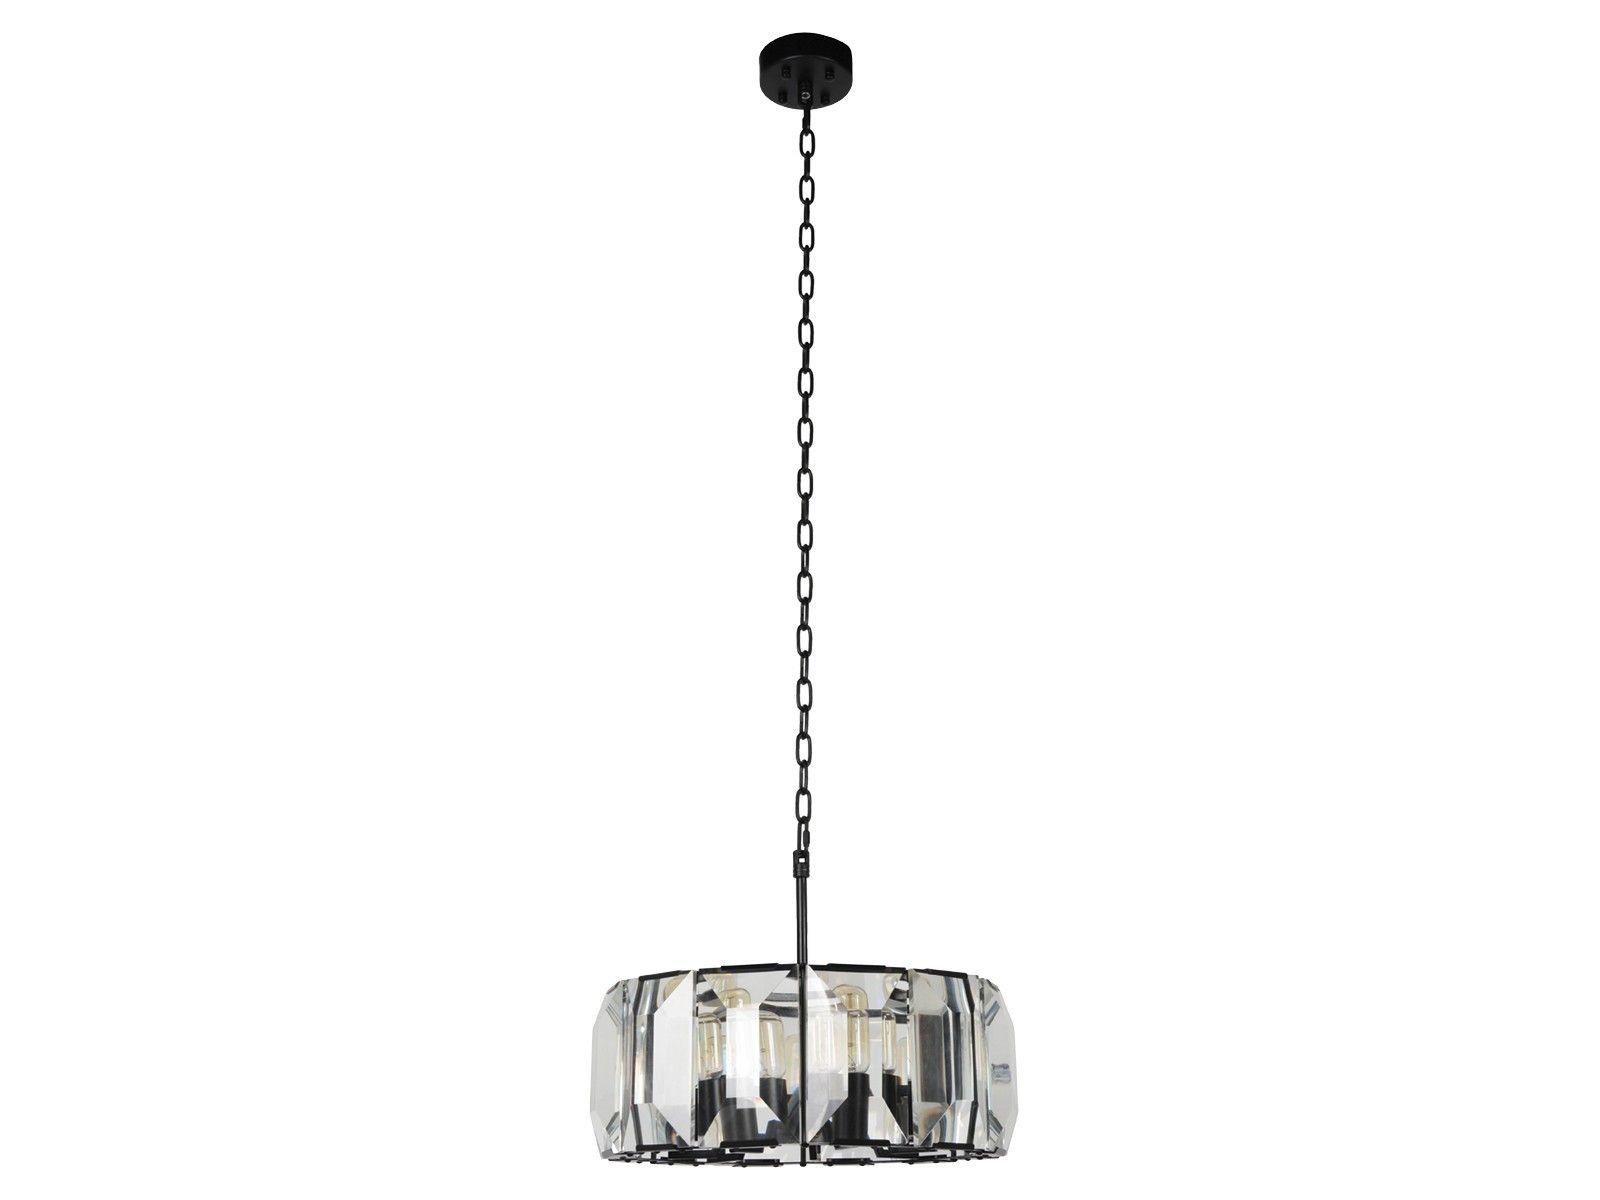 Hensley 7 light crystal pendant in black gc assess 3 pinterest hensley 7 light crystal pendant in black arubaitofo Gallery